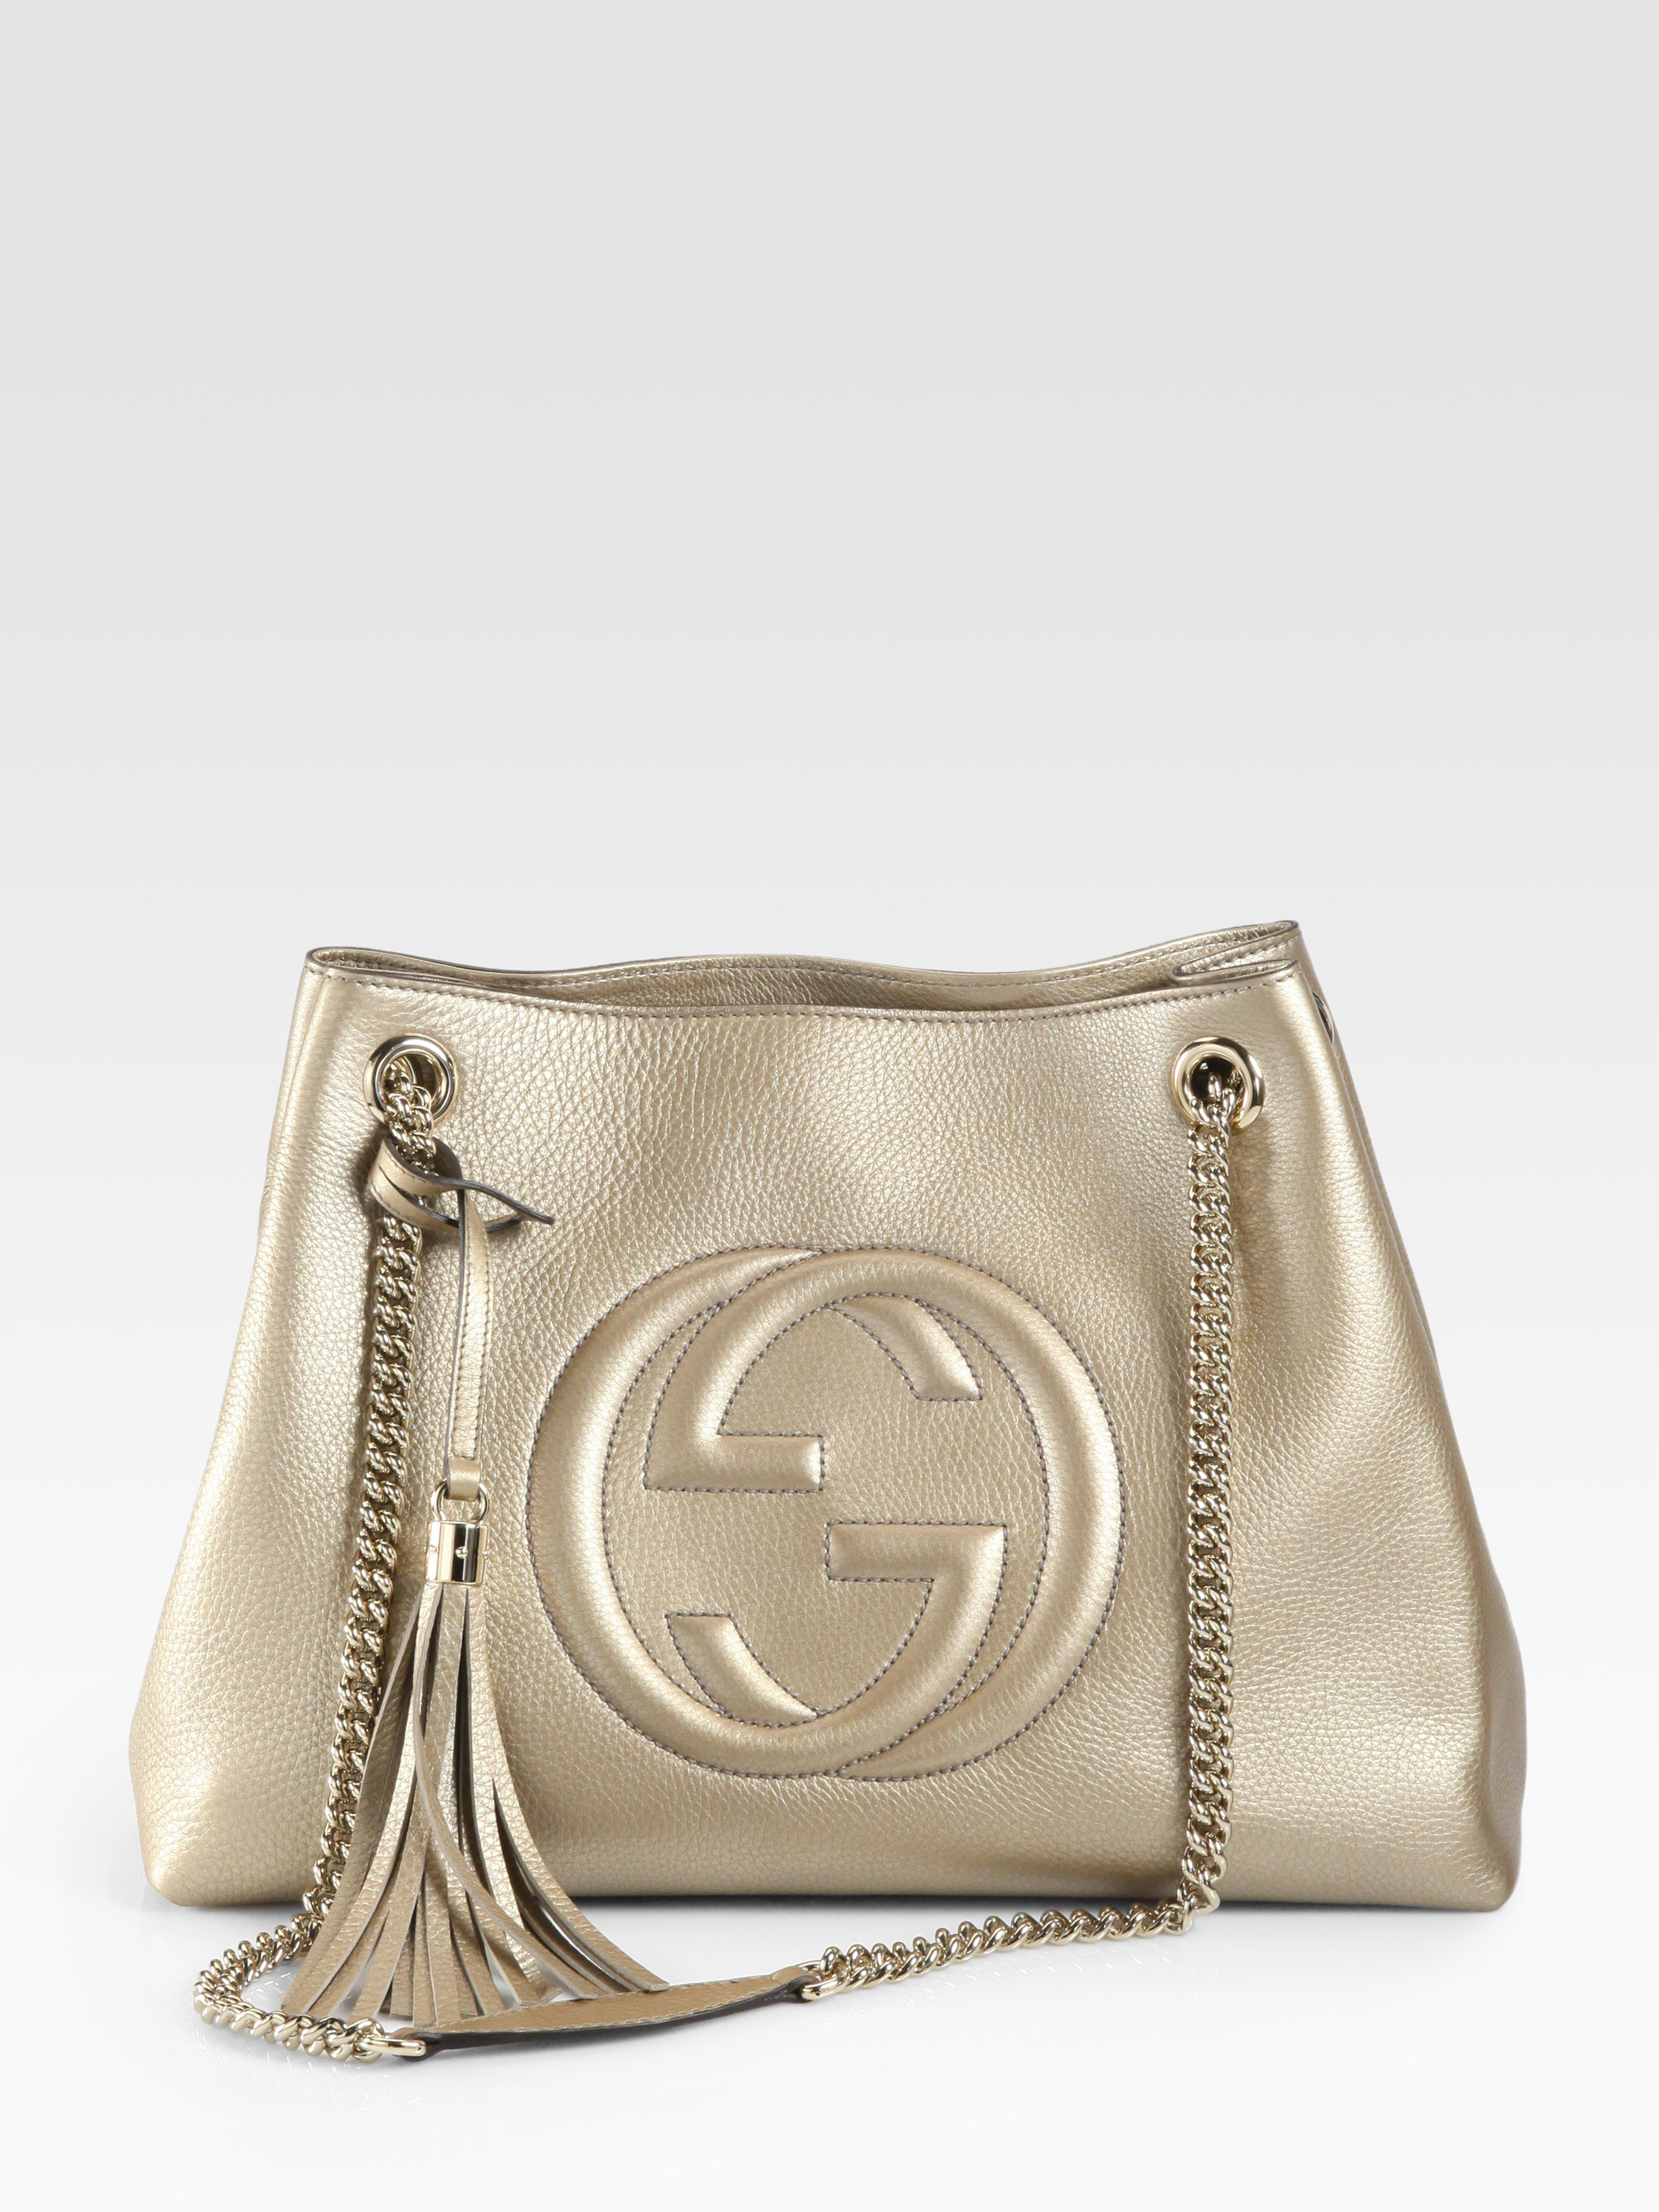 97e23f0416bf Gucci Soho Metallic Leather Shoulder Bag in Metallic - Lyst